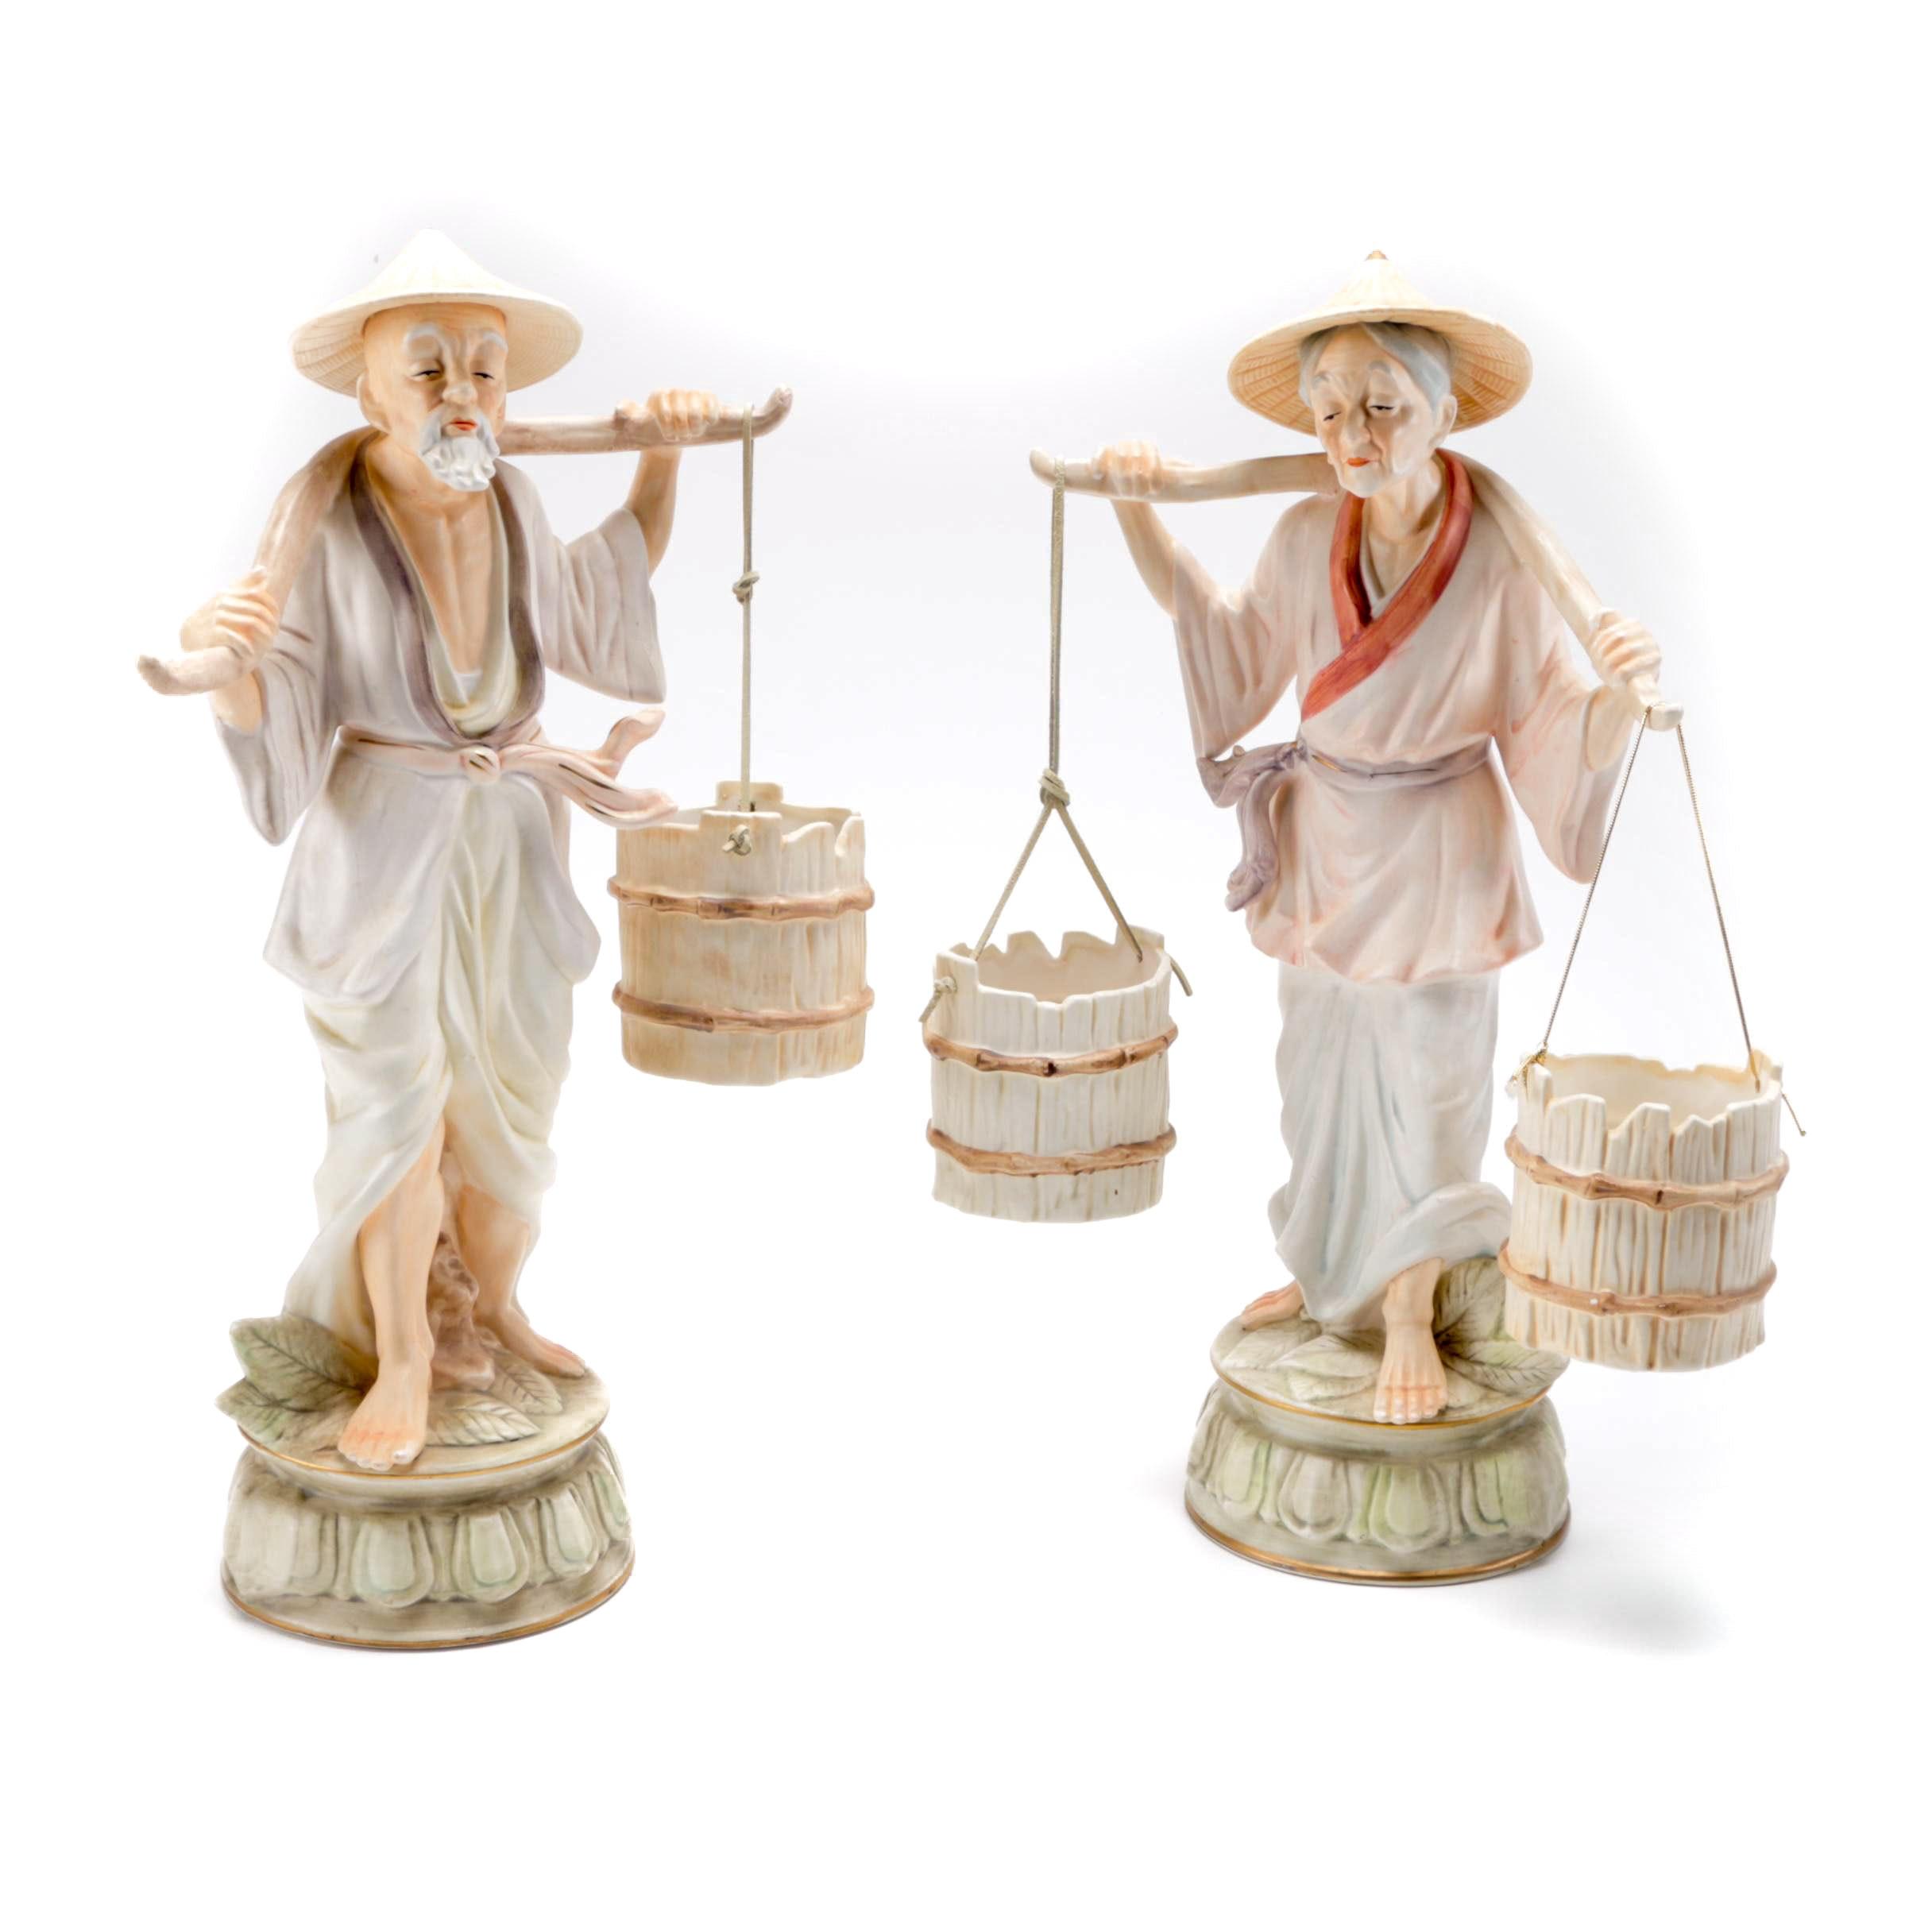 Japanese Water Carrier Ceramic Figurines